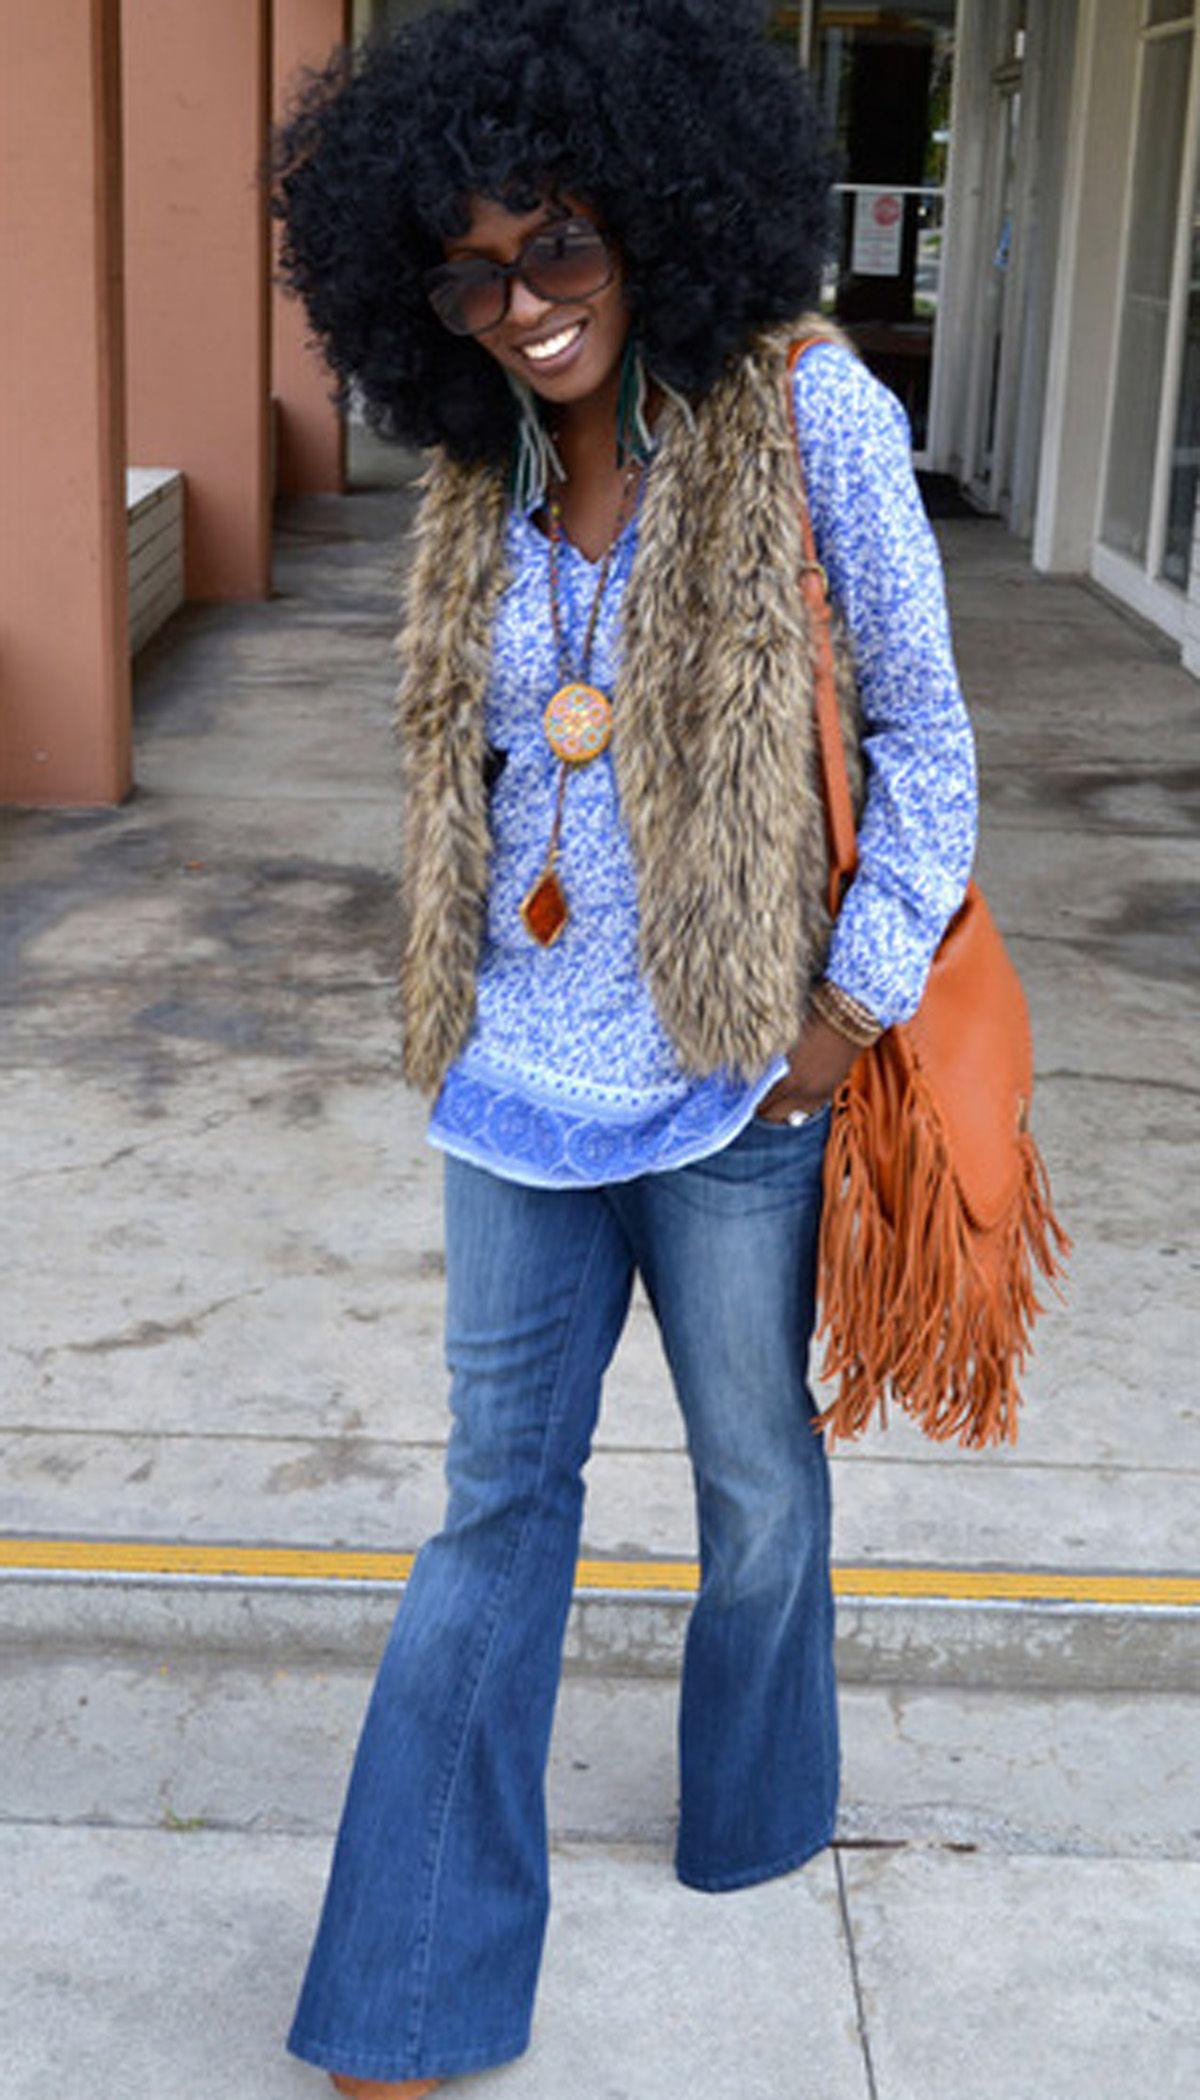 Pin By Dorothea Stewart On Black Americana 70s Fashion 70 S Fashion Fashion